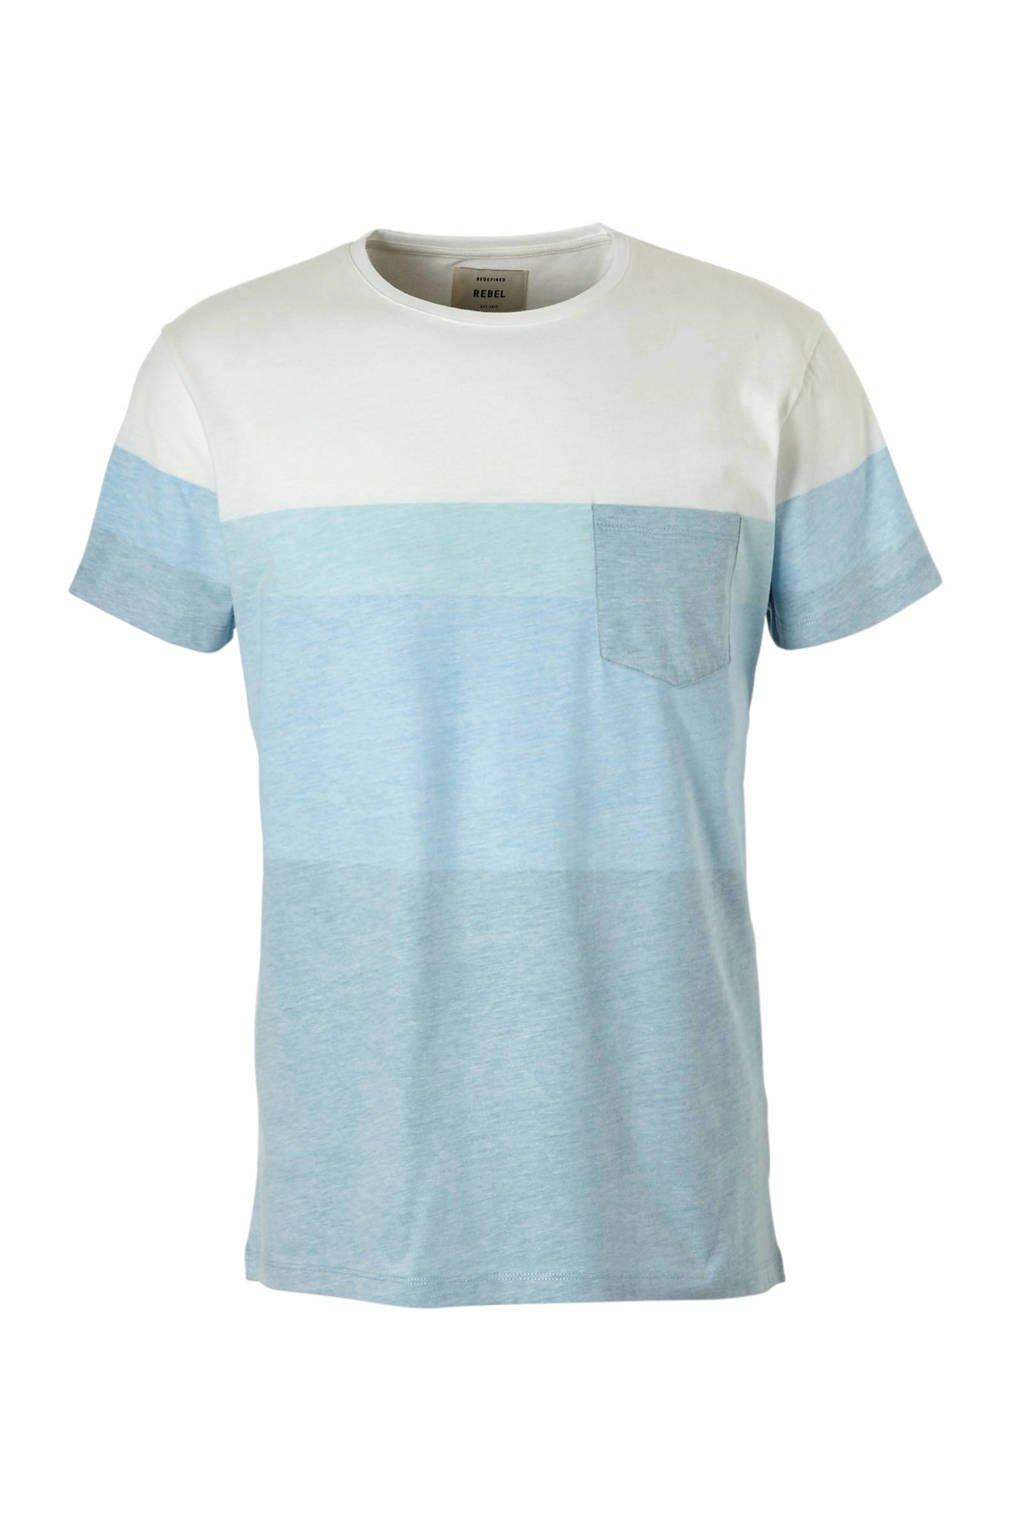 Redefined Rebel gemêleerd T-shirt Dexter, Blauw/wit